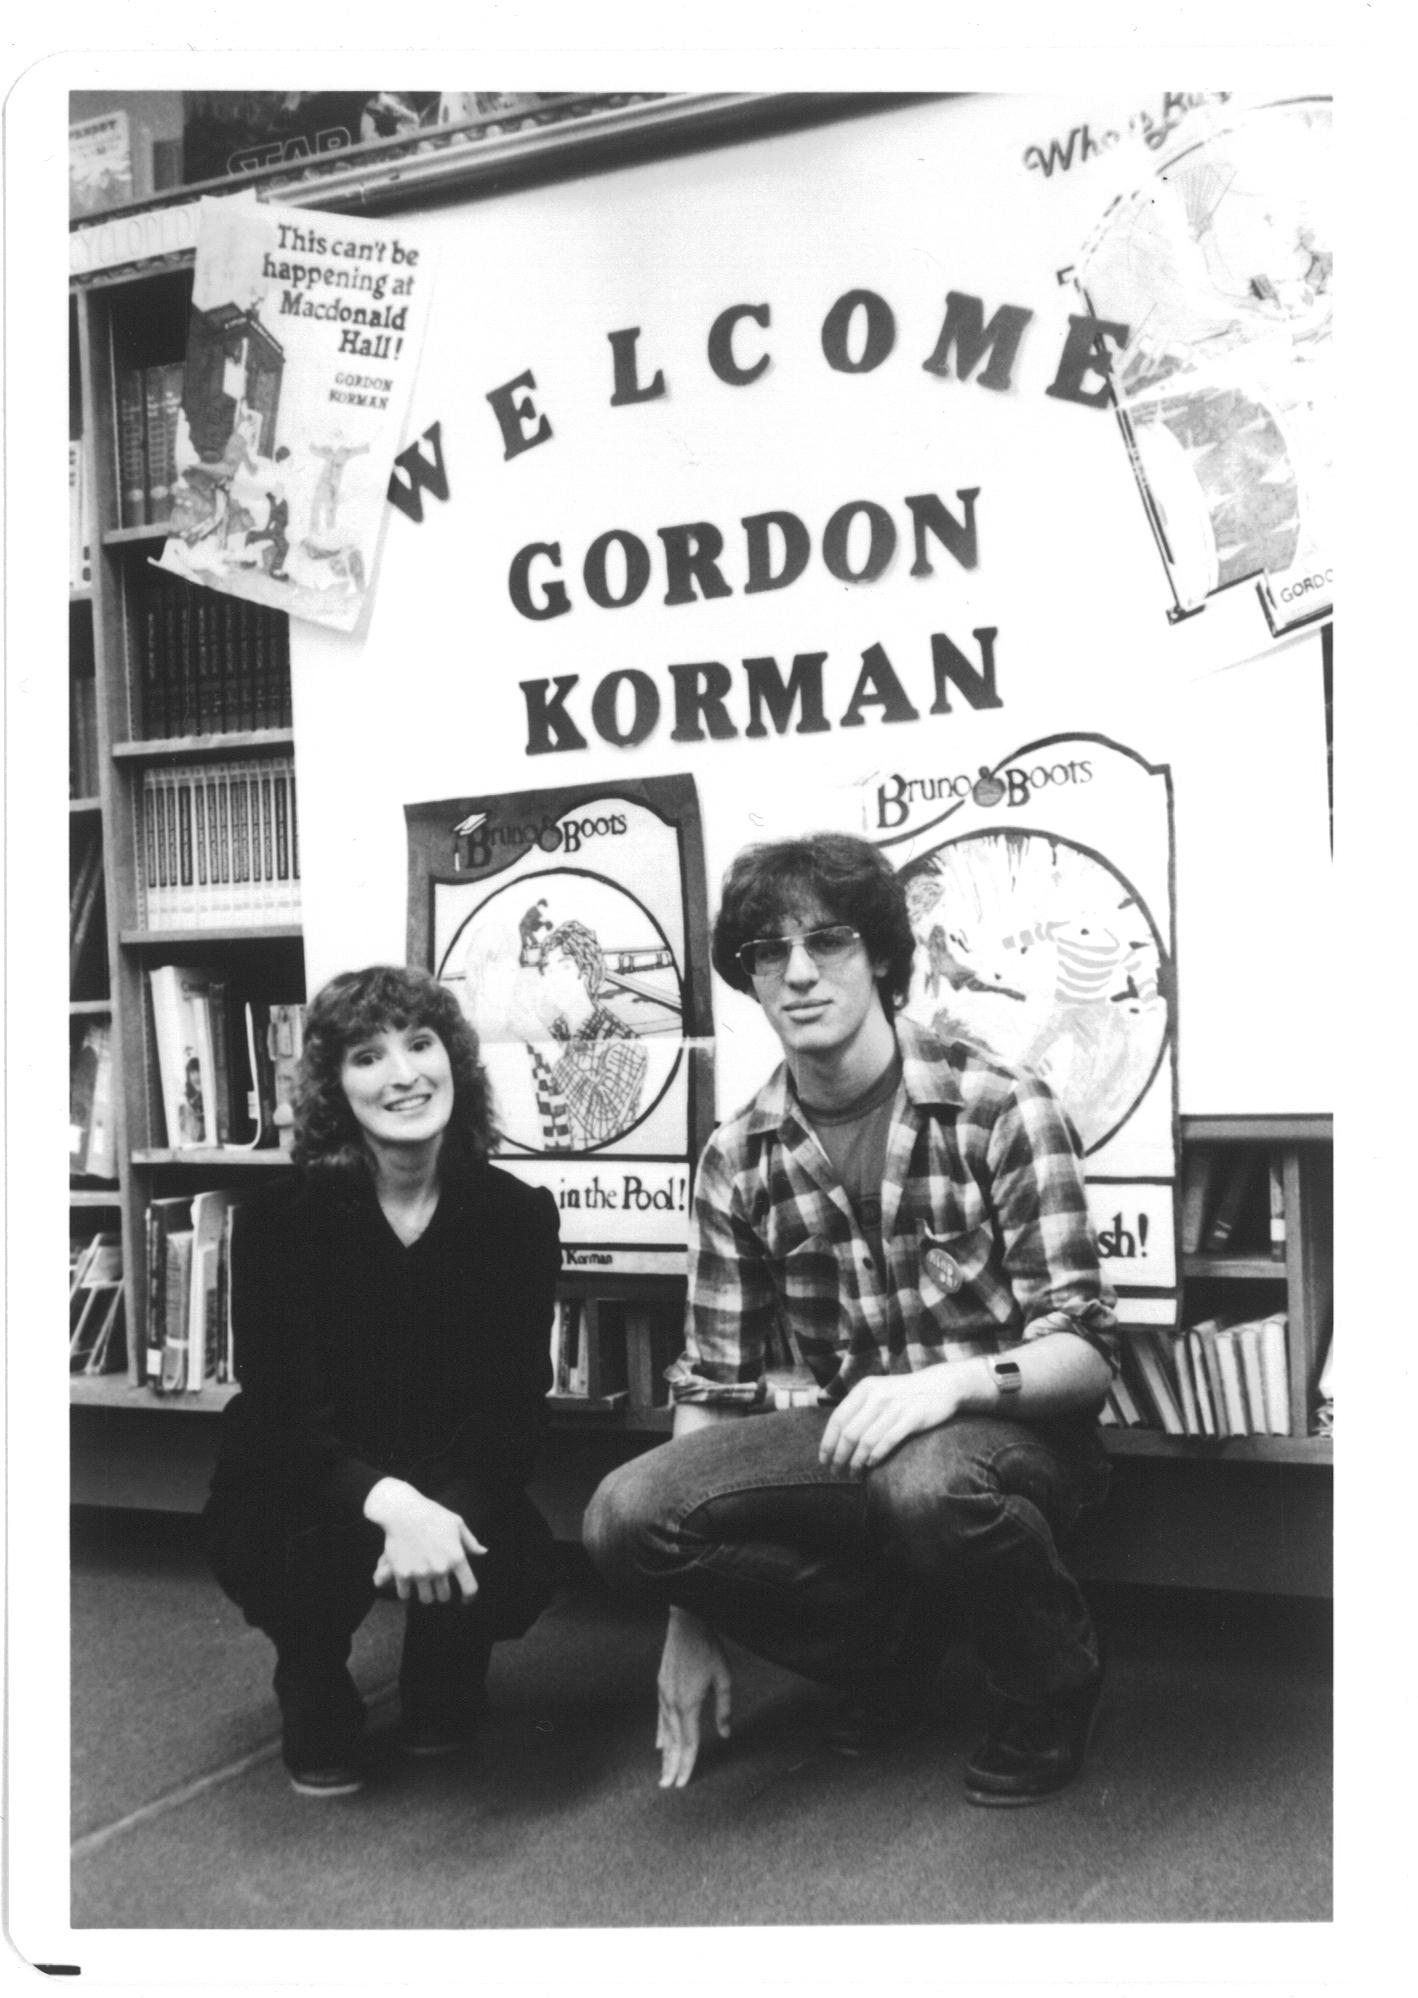 Pictures gordon kormans wife, hot teens havi g sex